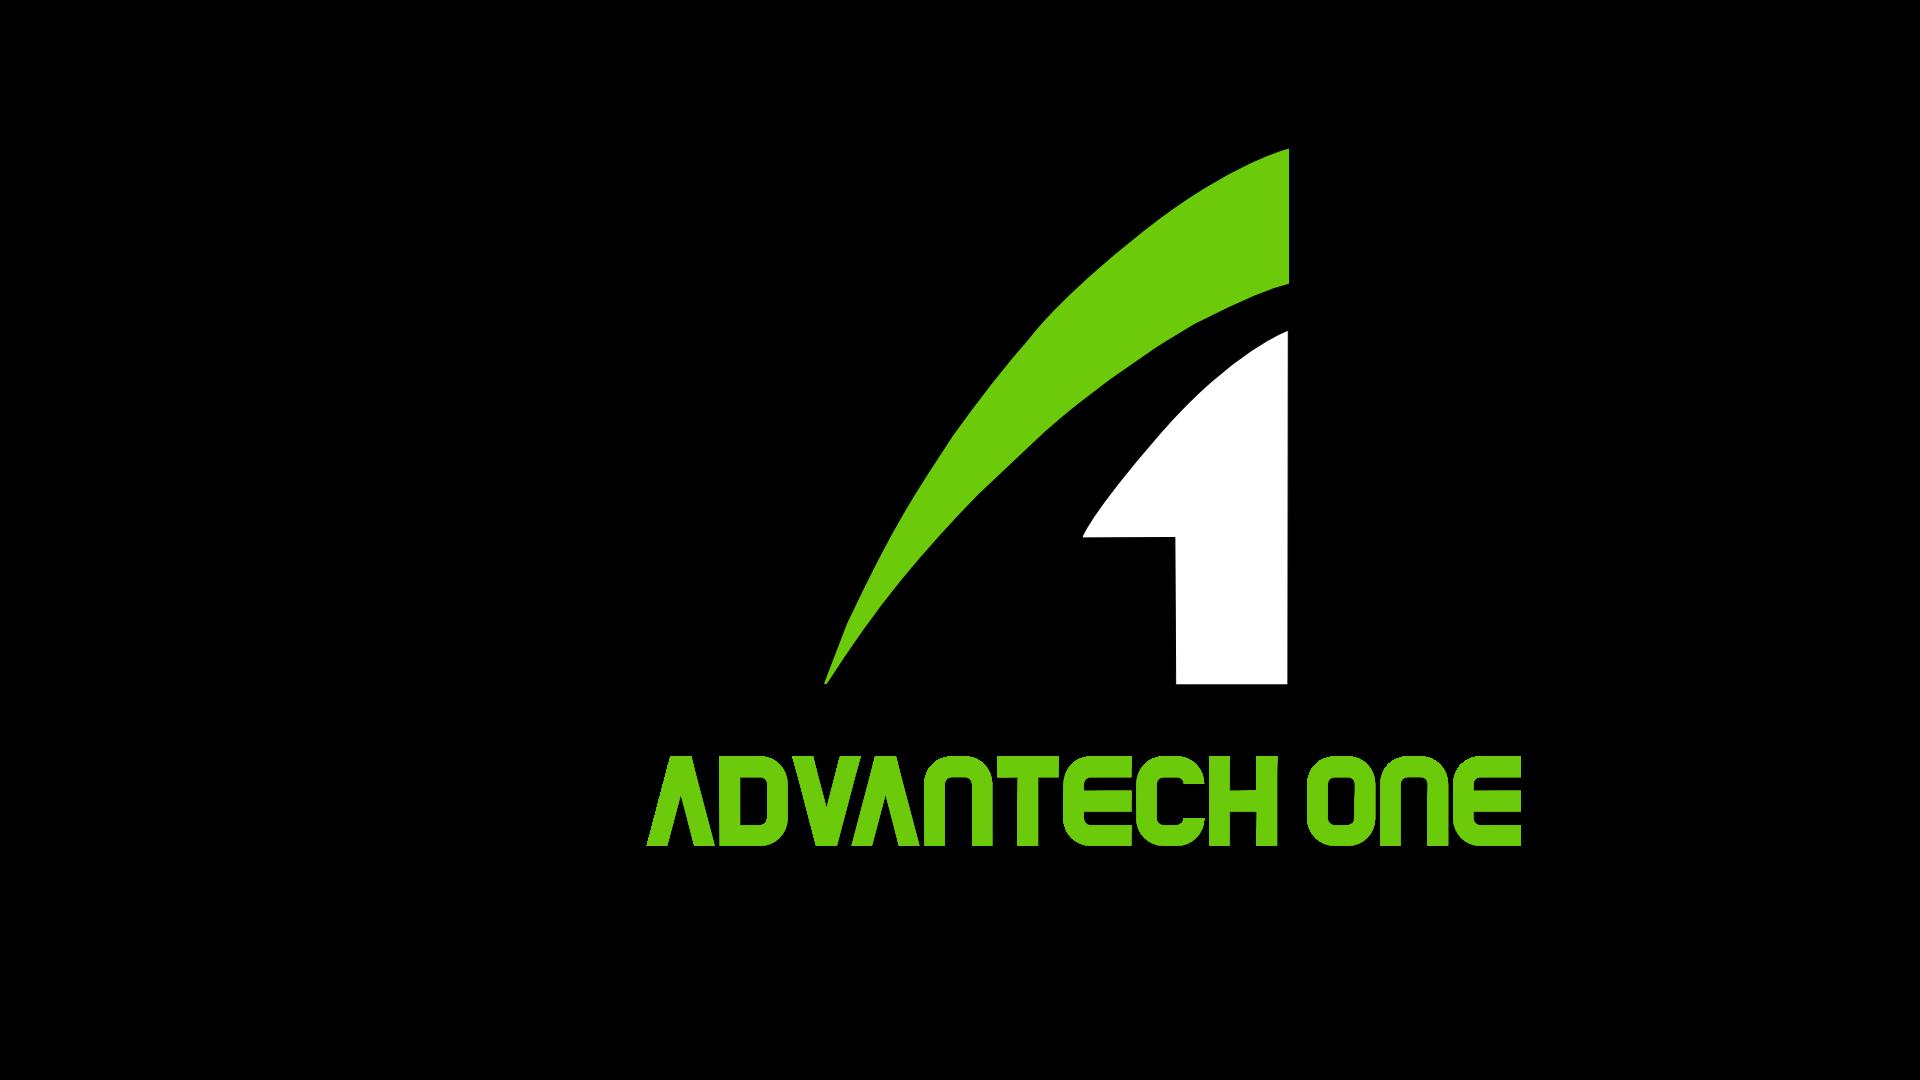 Advantech ONE